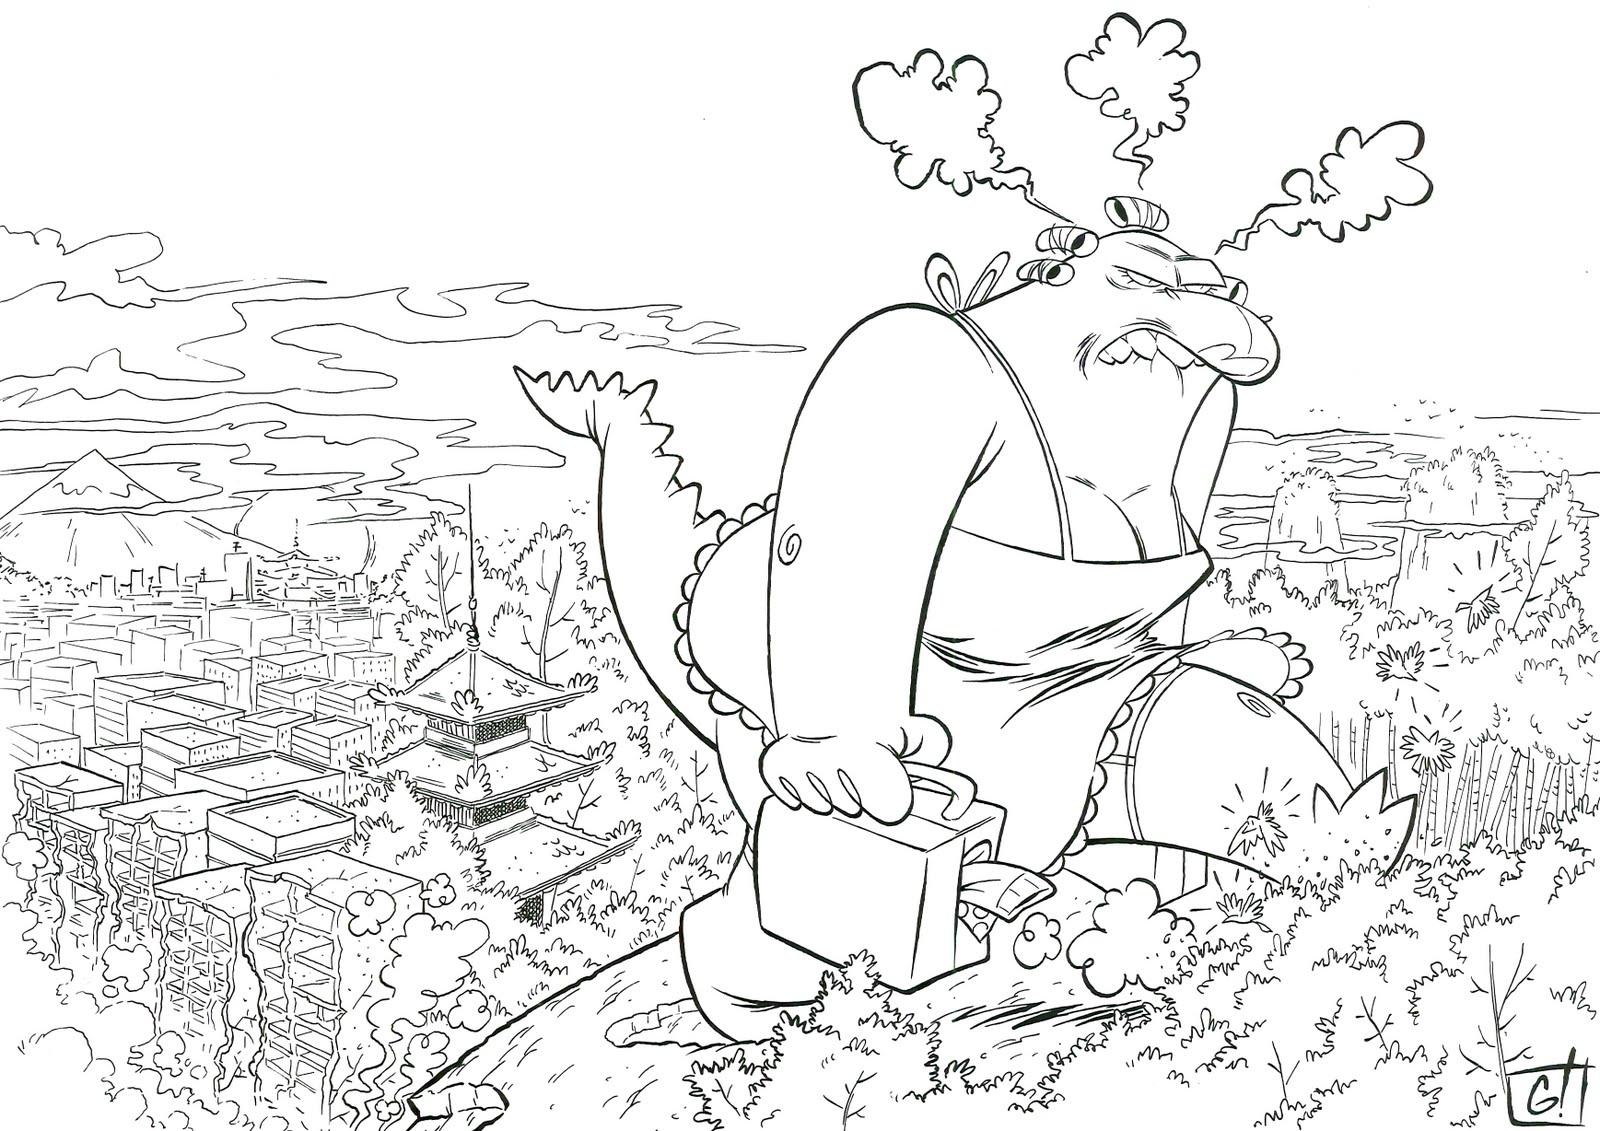 Famoso Colorear Godzilla Cresta - Dibujos Para Colorear En Línea ...